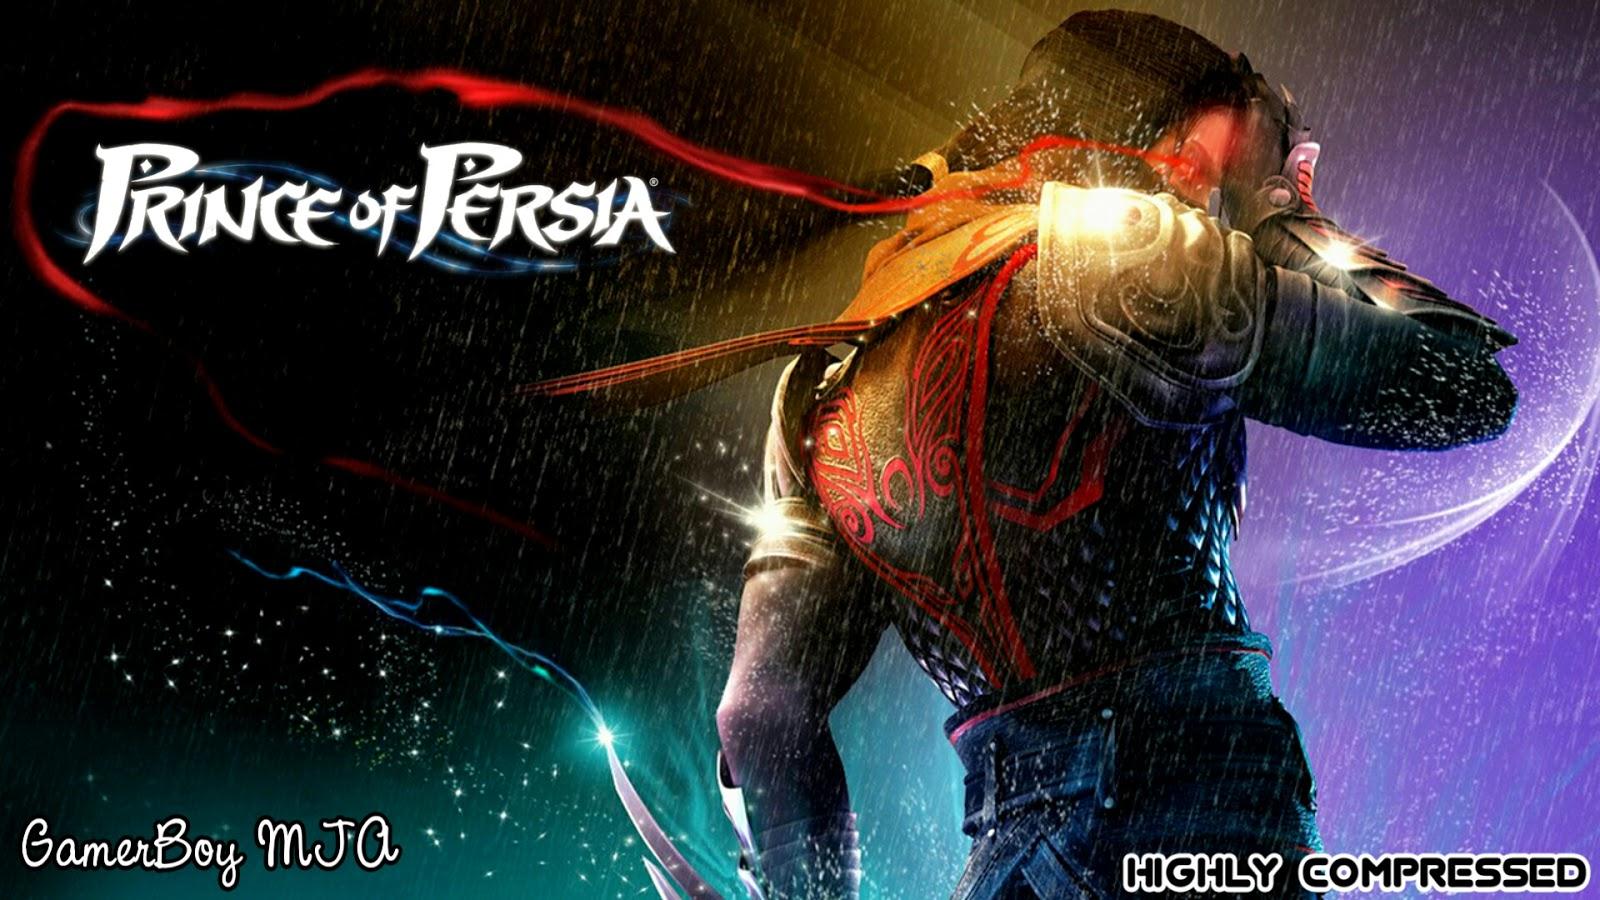 Prince of persia на xbox 360 freeboot скачать торрент prakard.